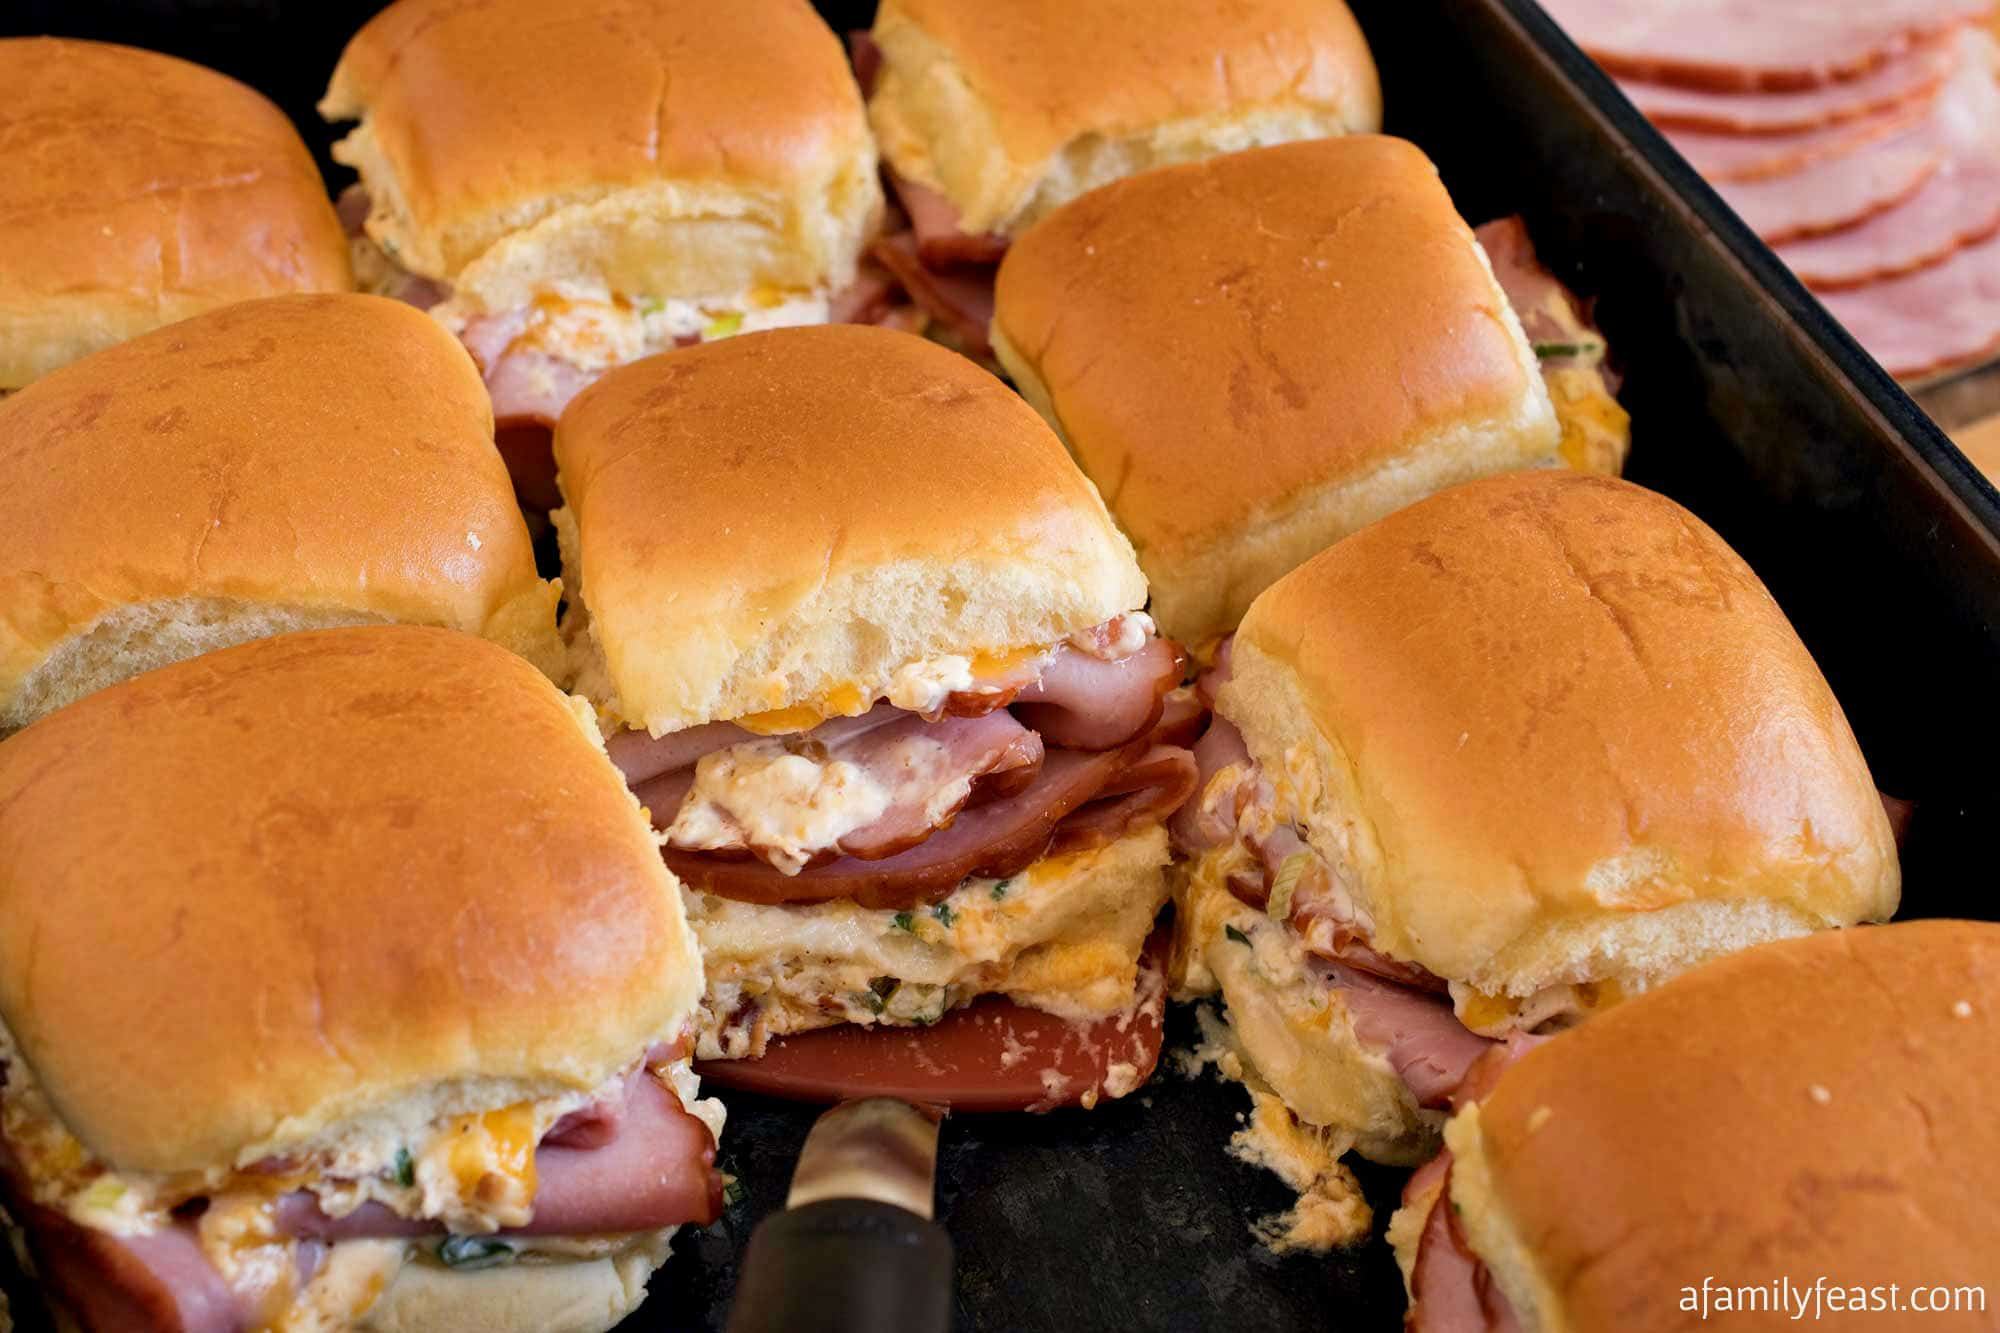 Tray of Mississippi ham sliders